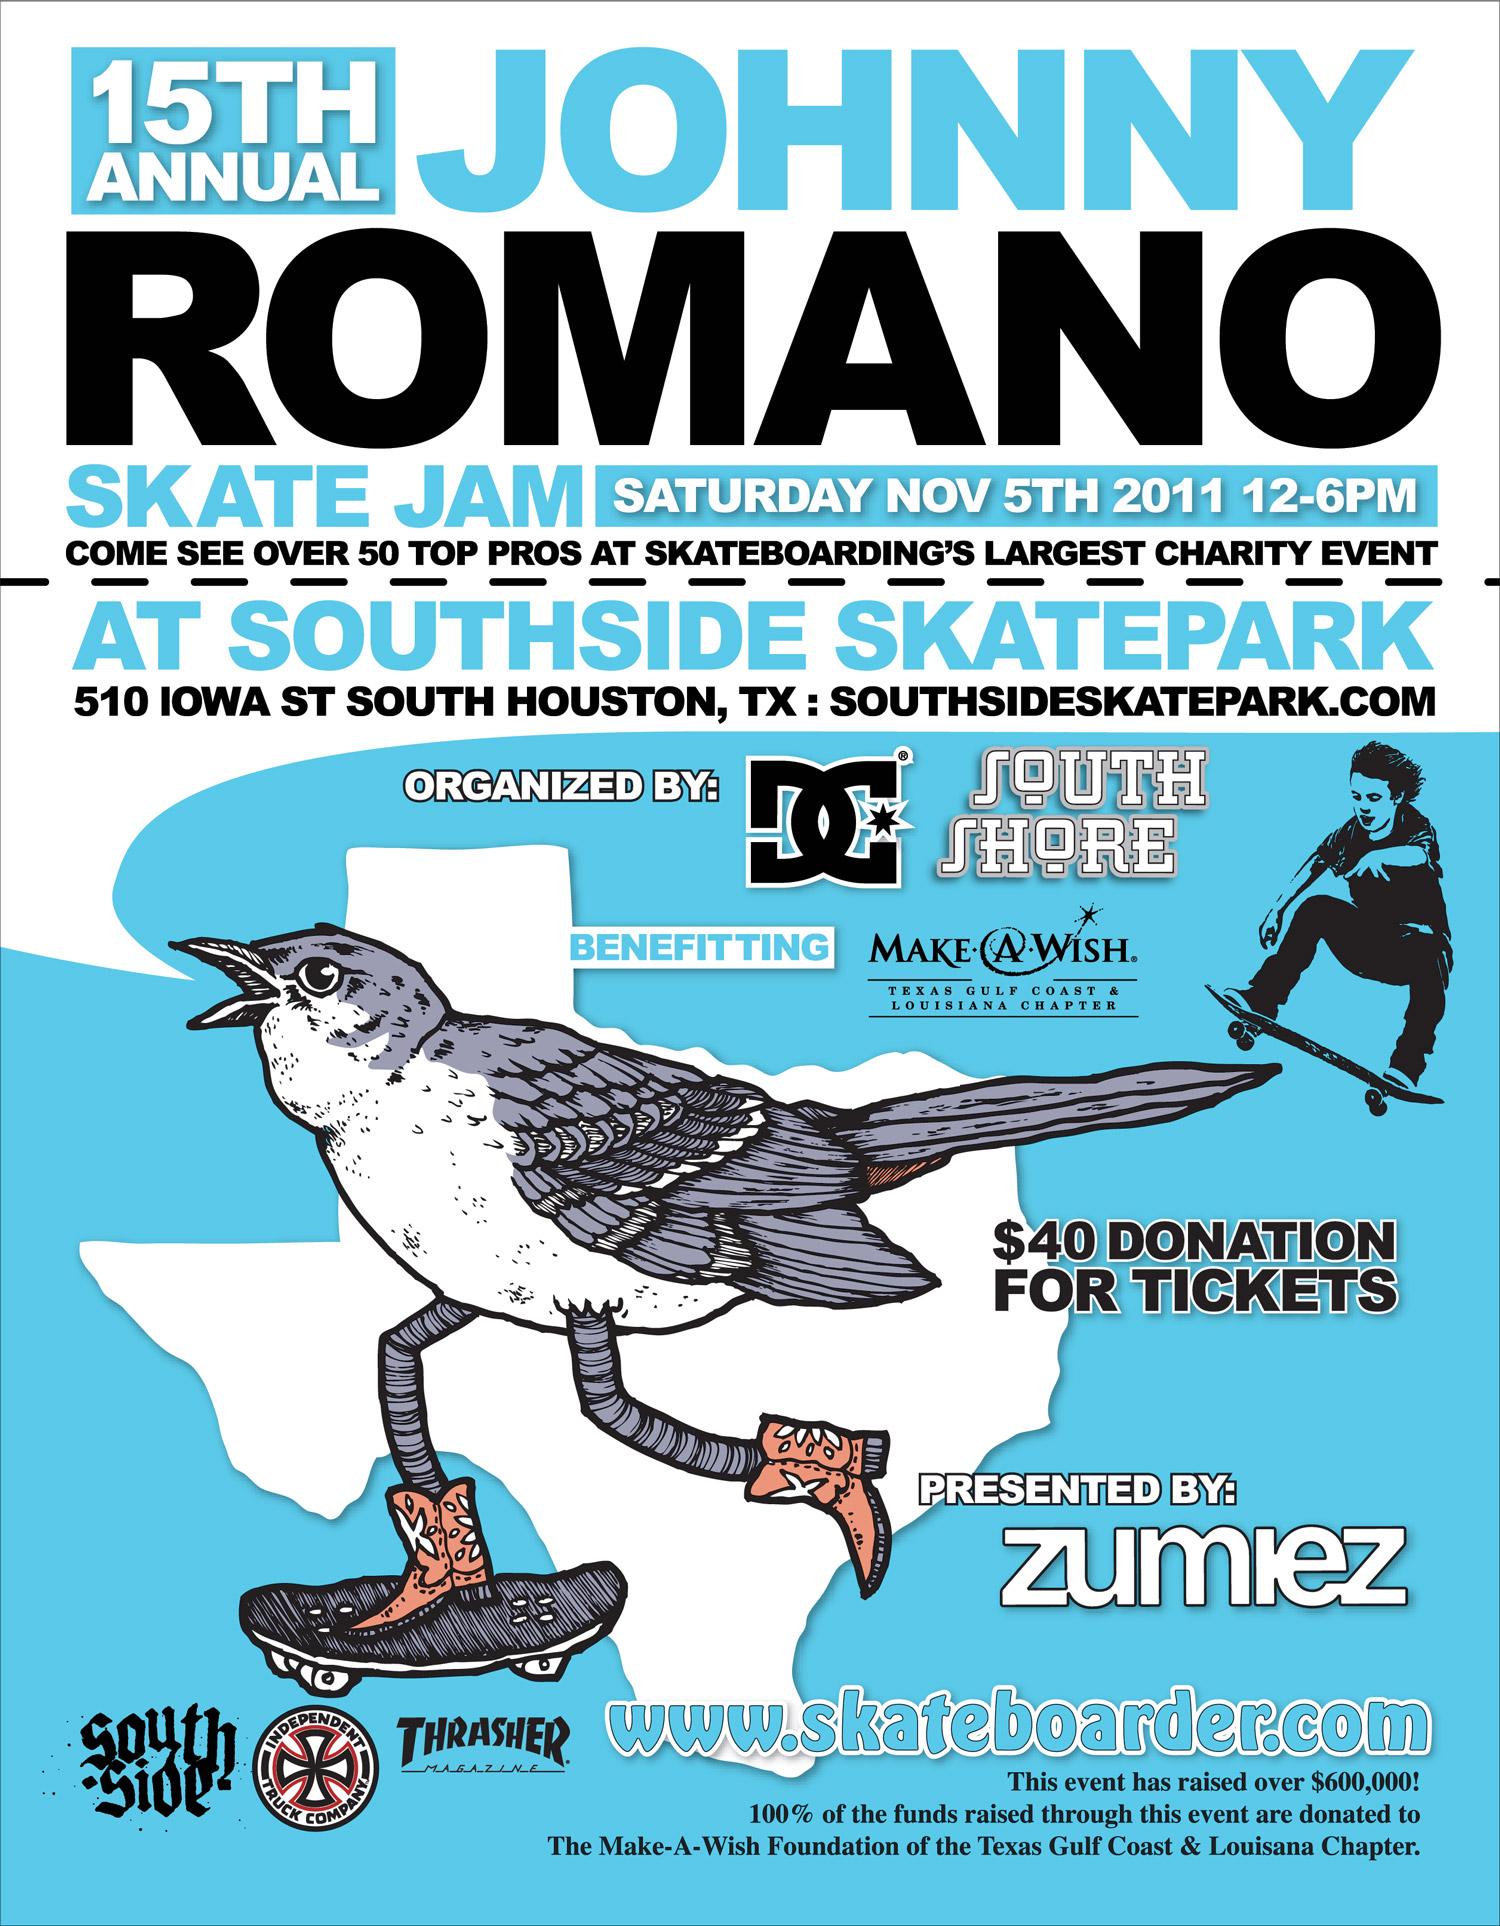 Johnny Romano Skate Jam Ad